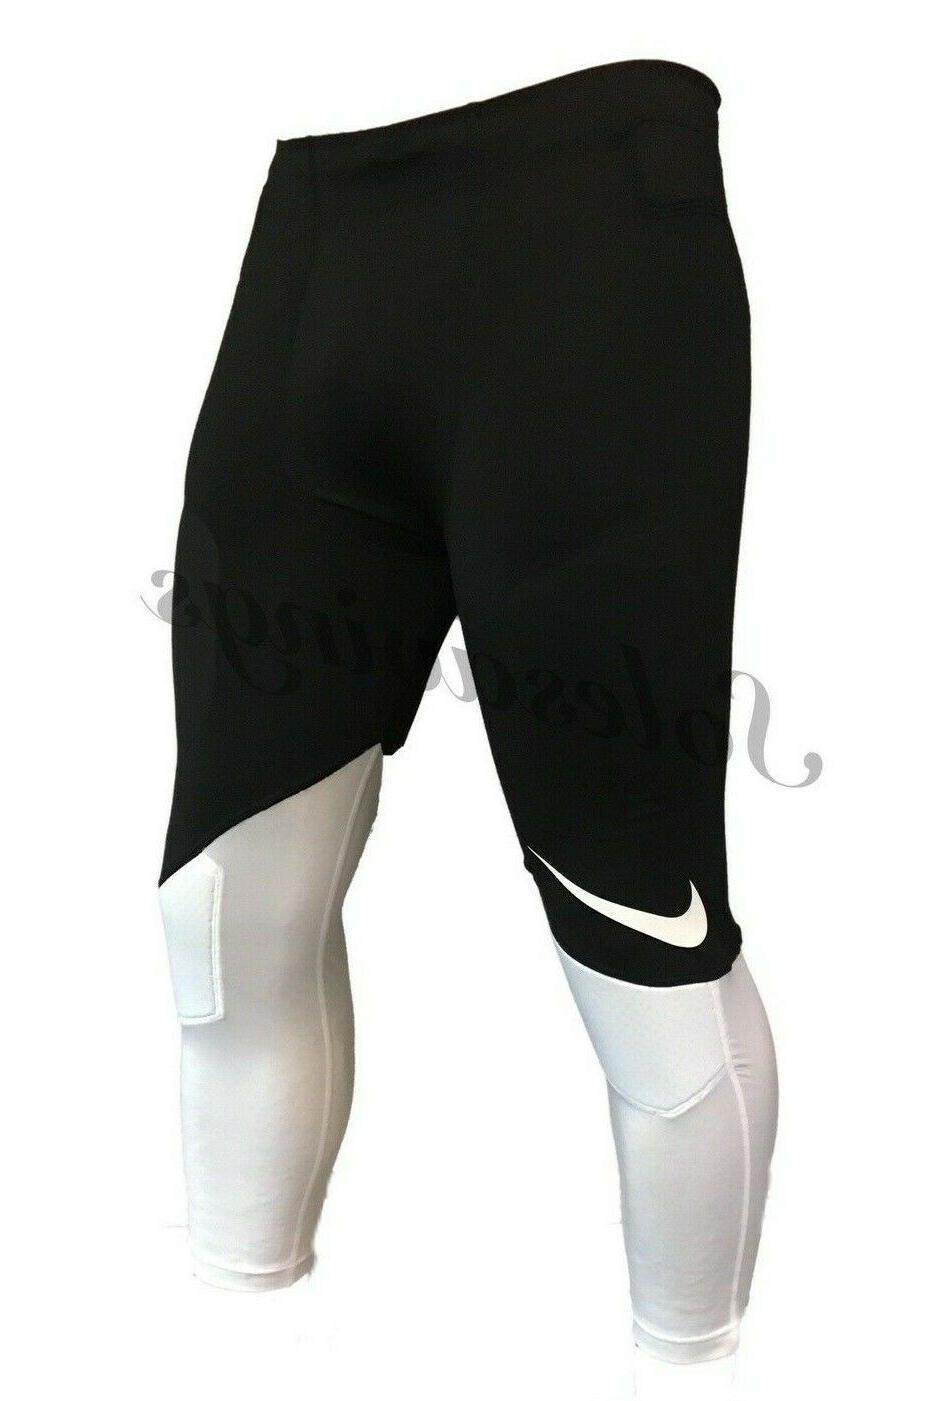 Nike Football 3/4 Pants Black/White Flag Football